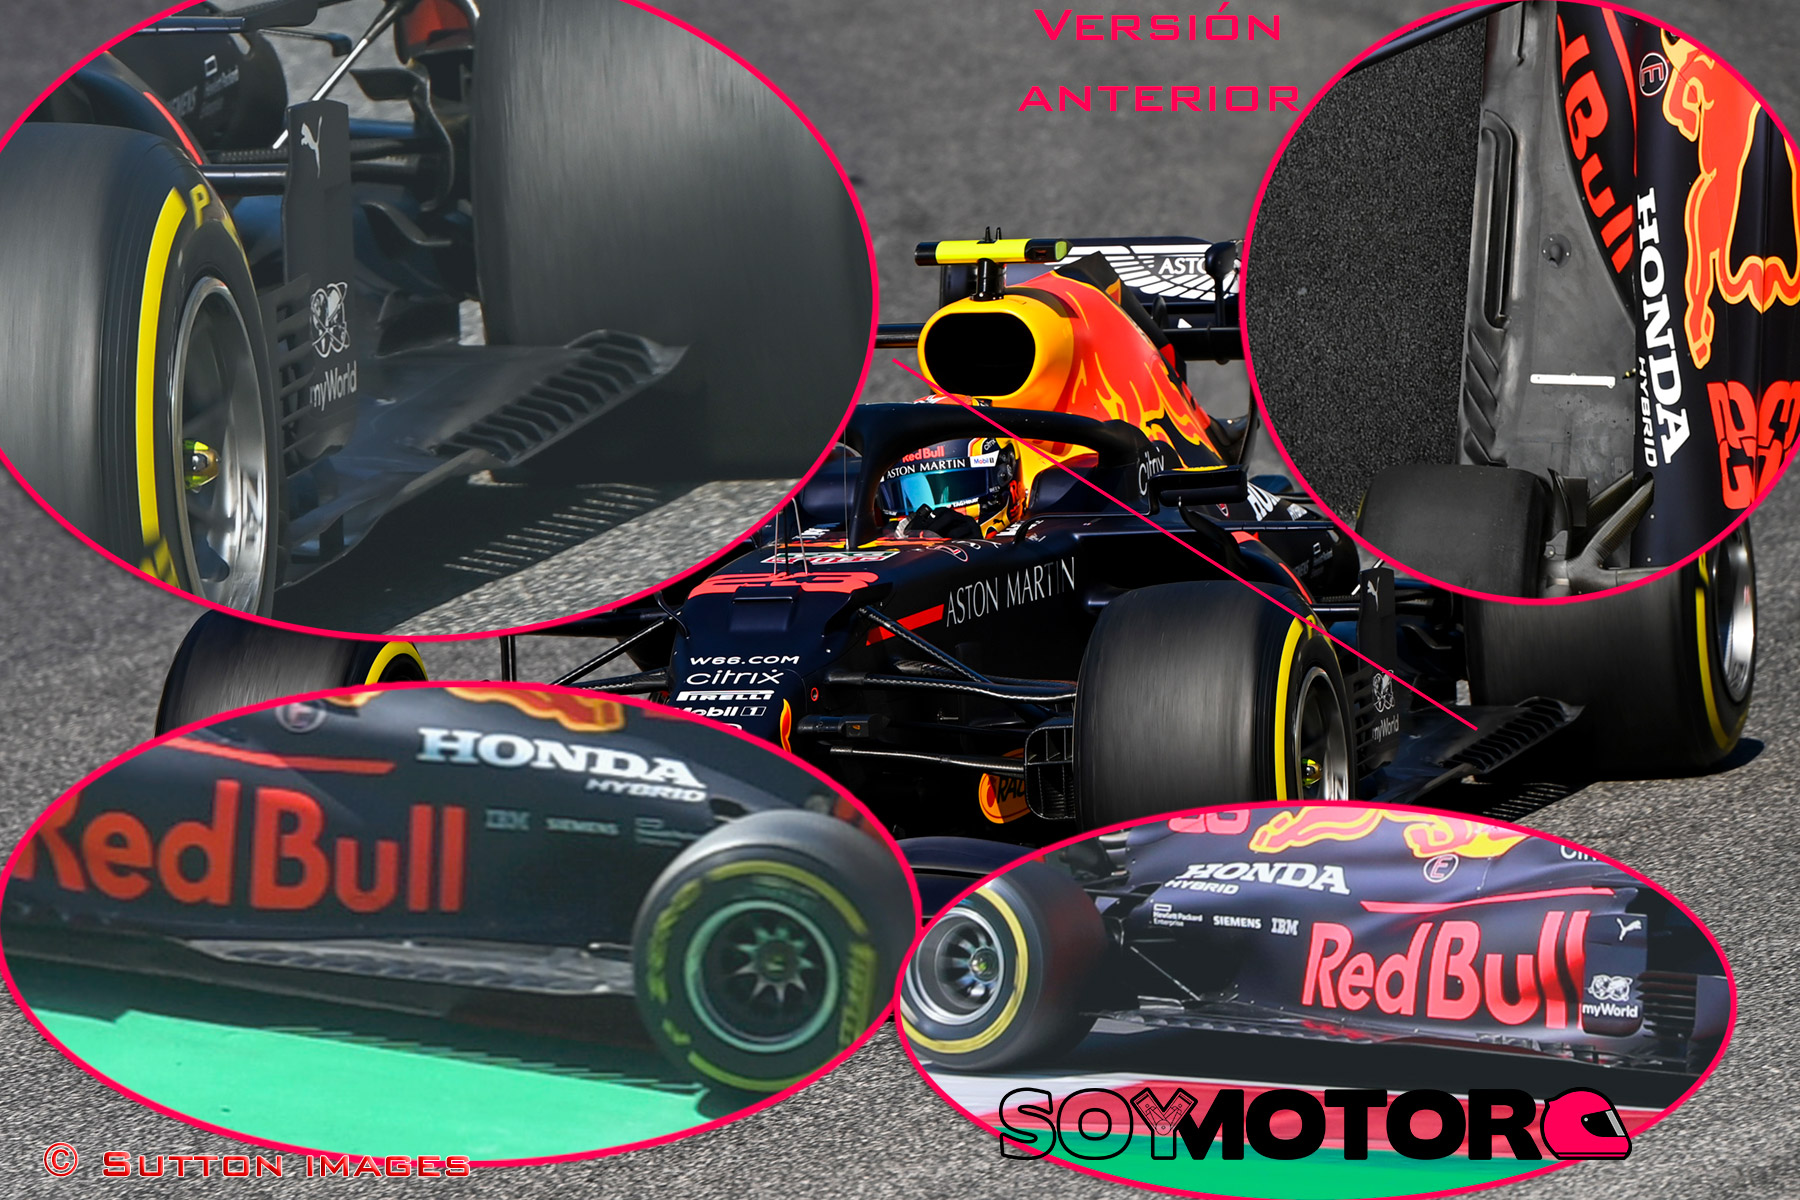 red-bull-nuevo-suelo-soymotor.jpg